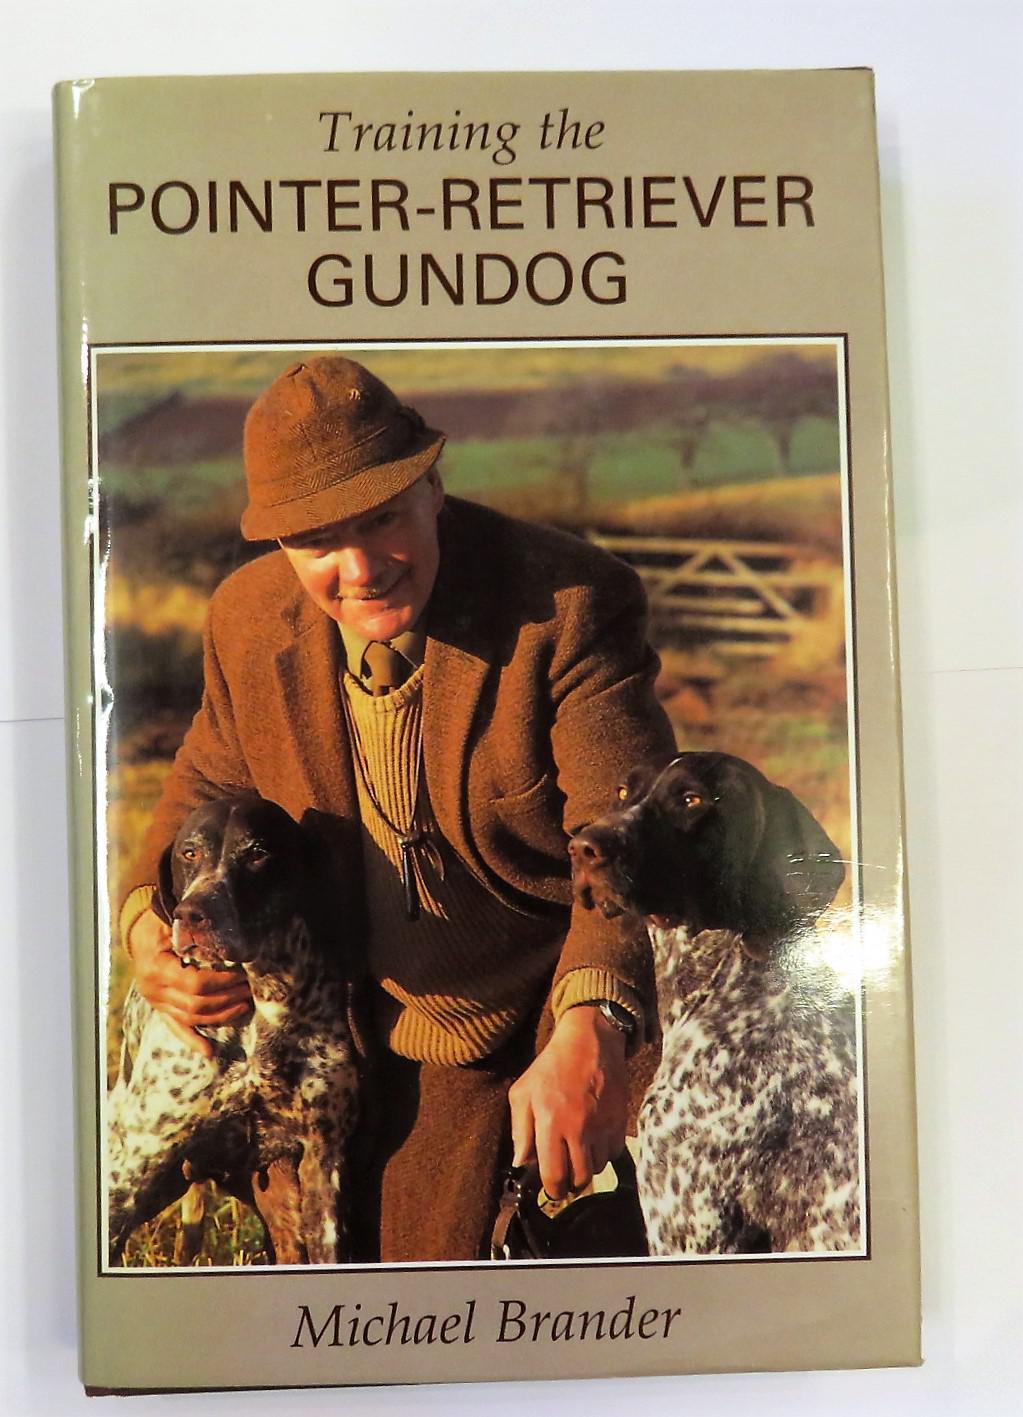 Training the Pointer Retriever Gundog